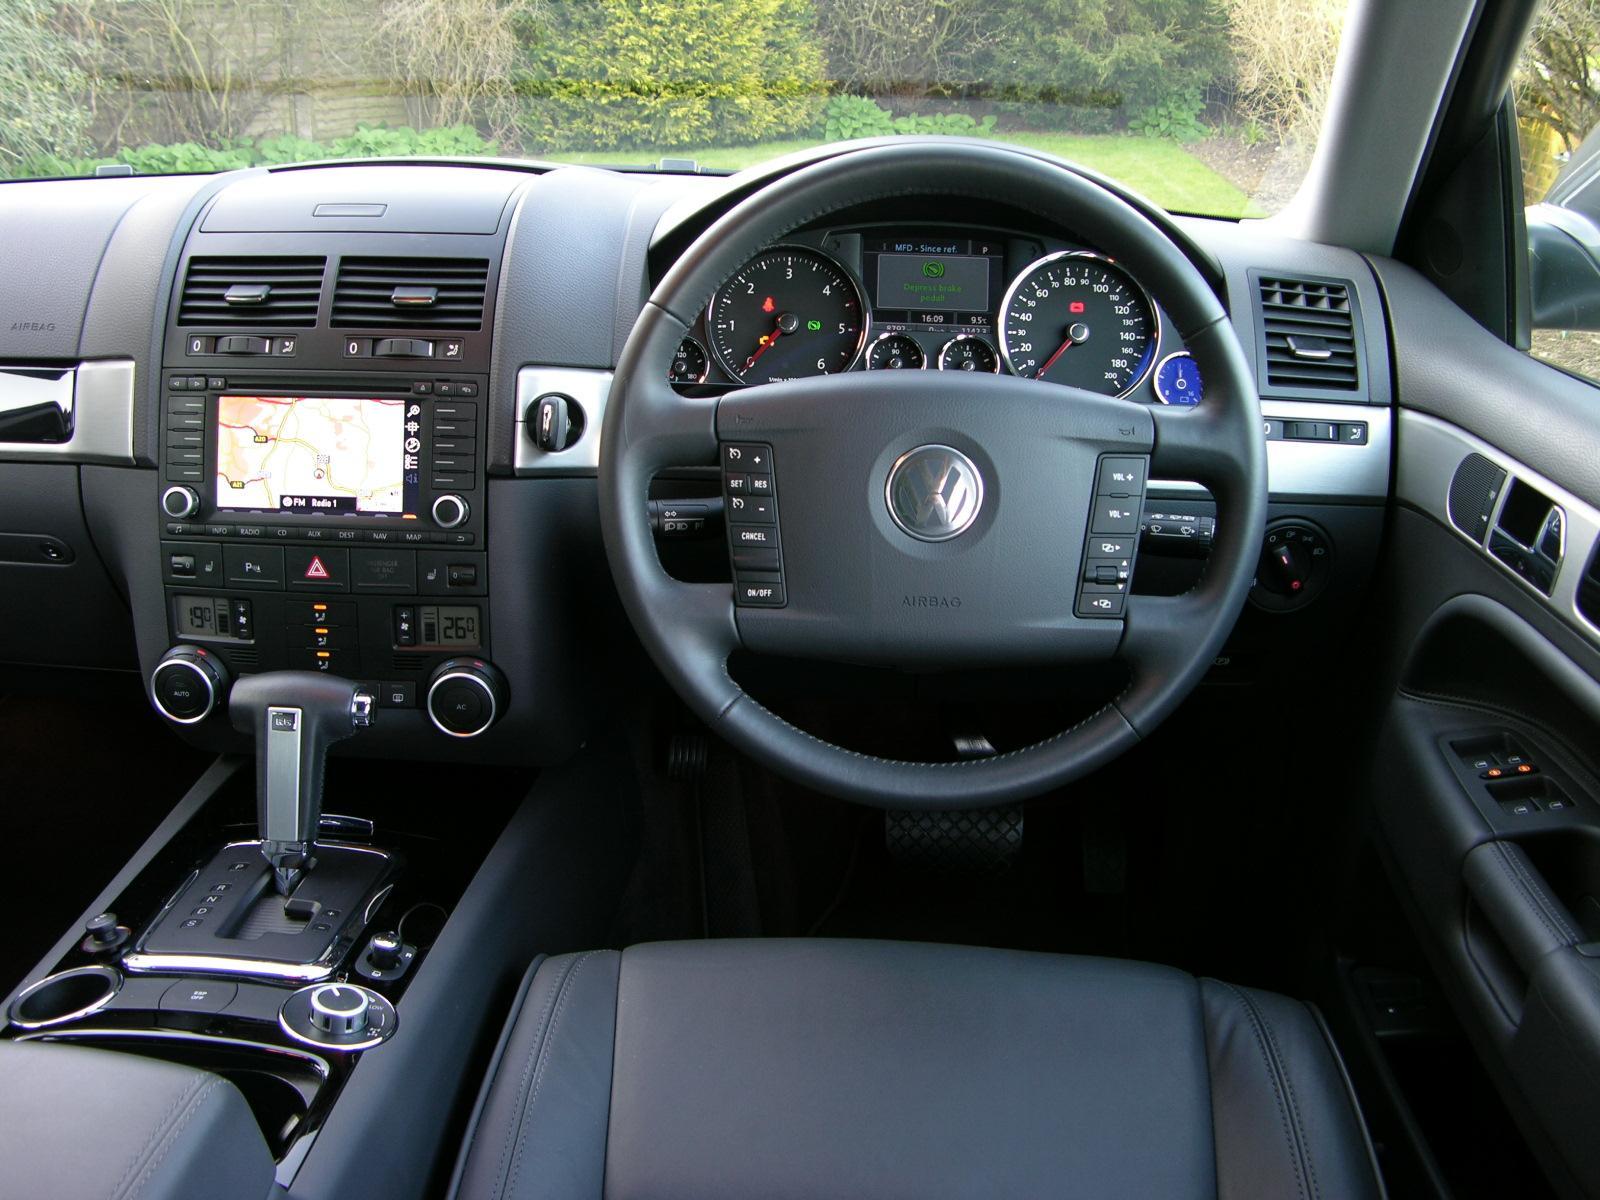 File:VW Touareg 2.5 Tdi SE - Flickr - The Car Spy (5).jpg ...